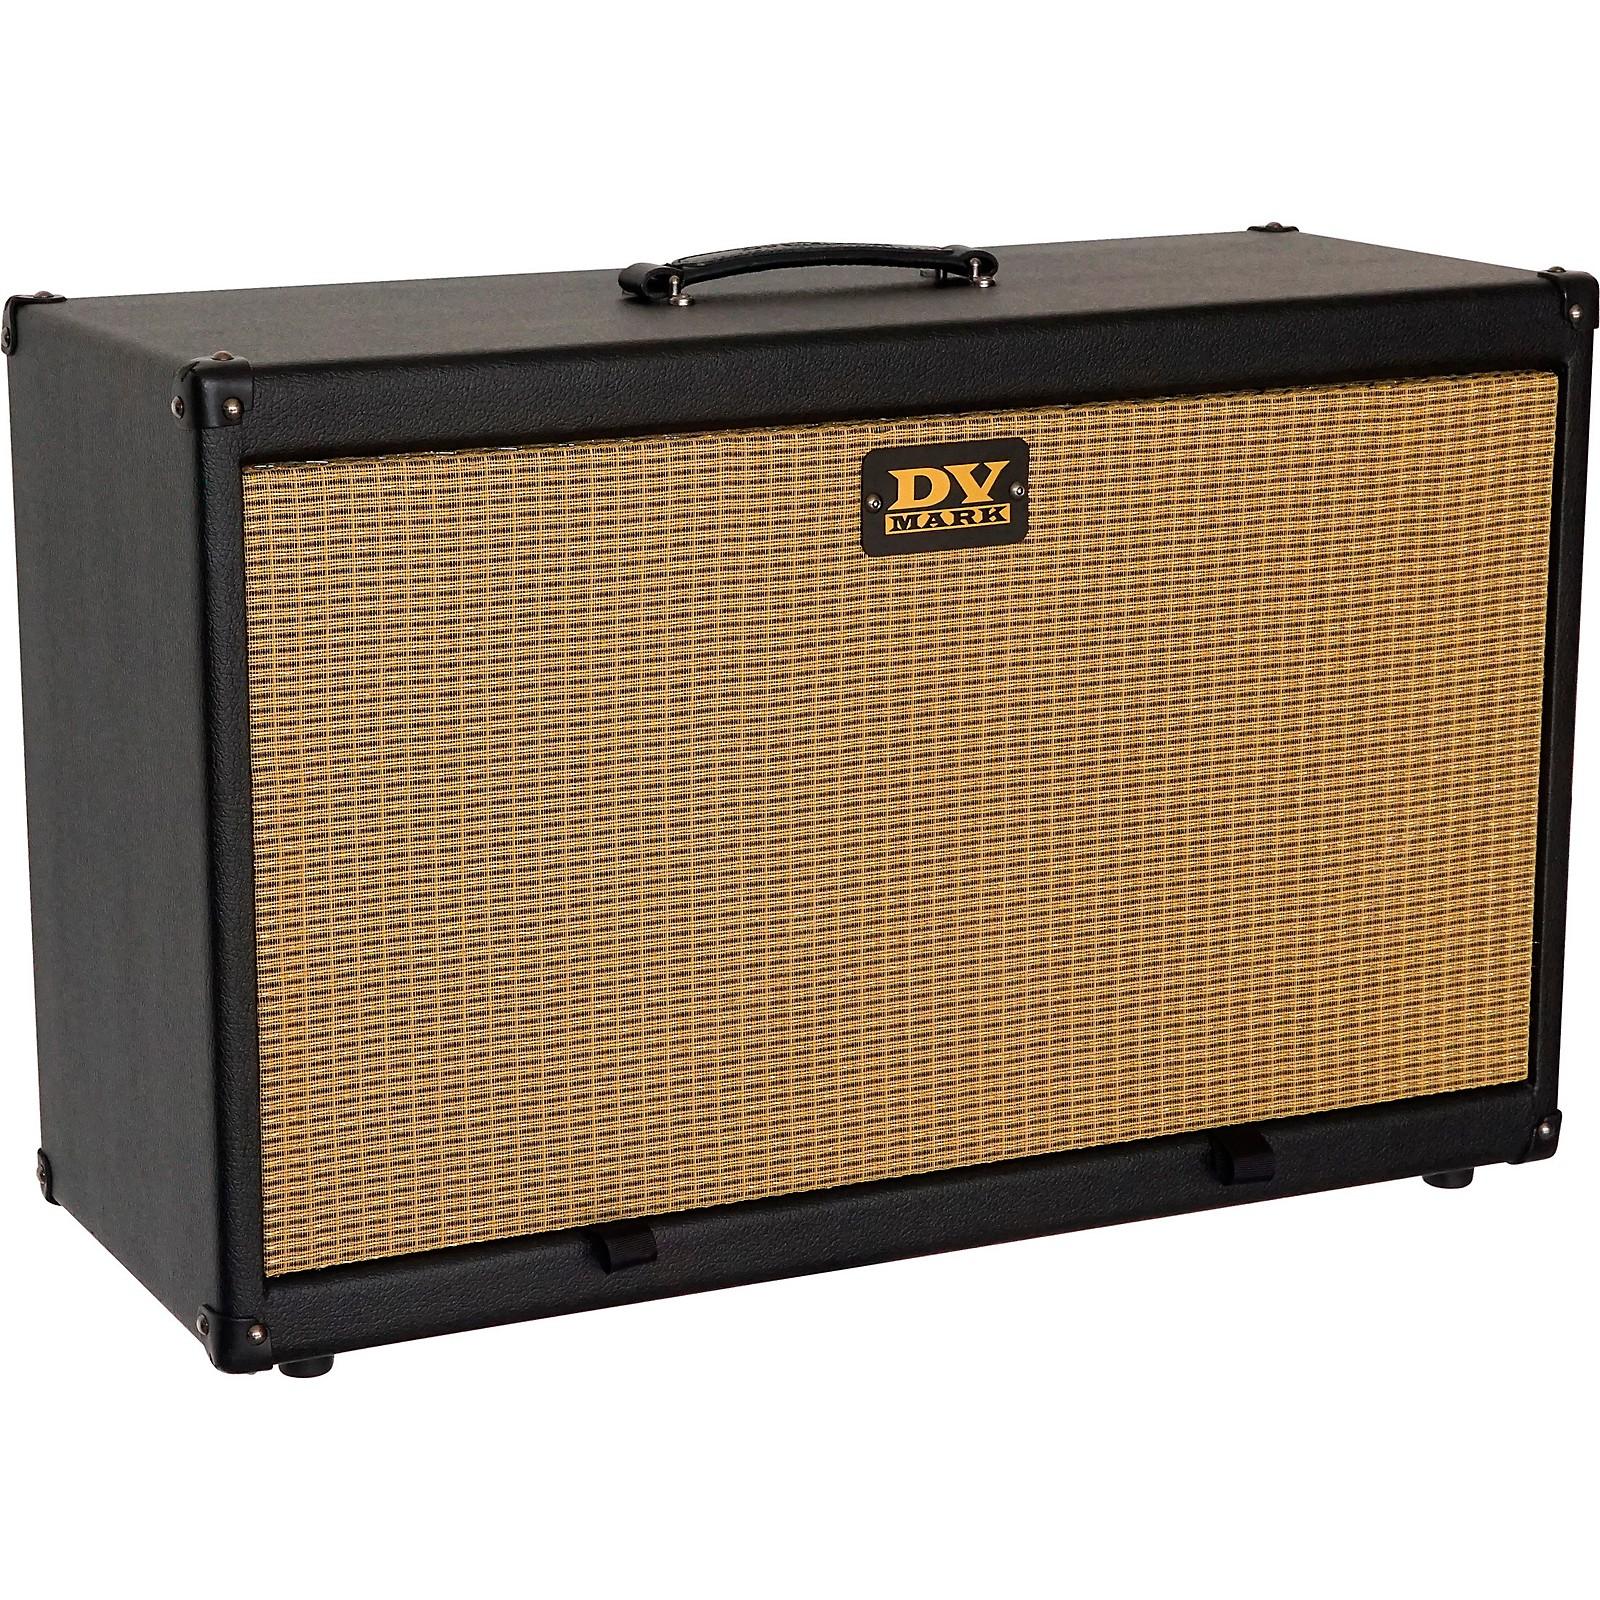 DV Mark DV Gold 212 300W 2x12 Guitar Speaker Cabinet